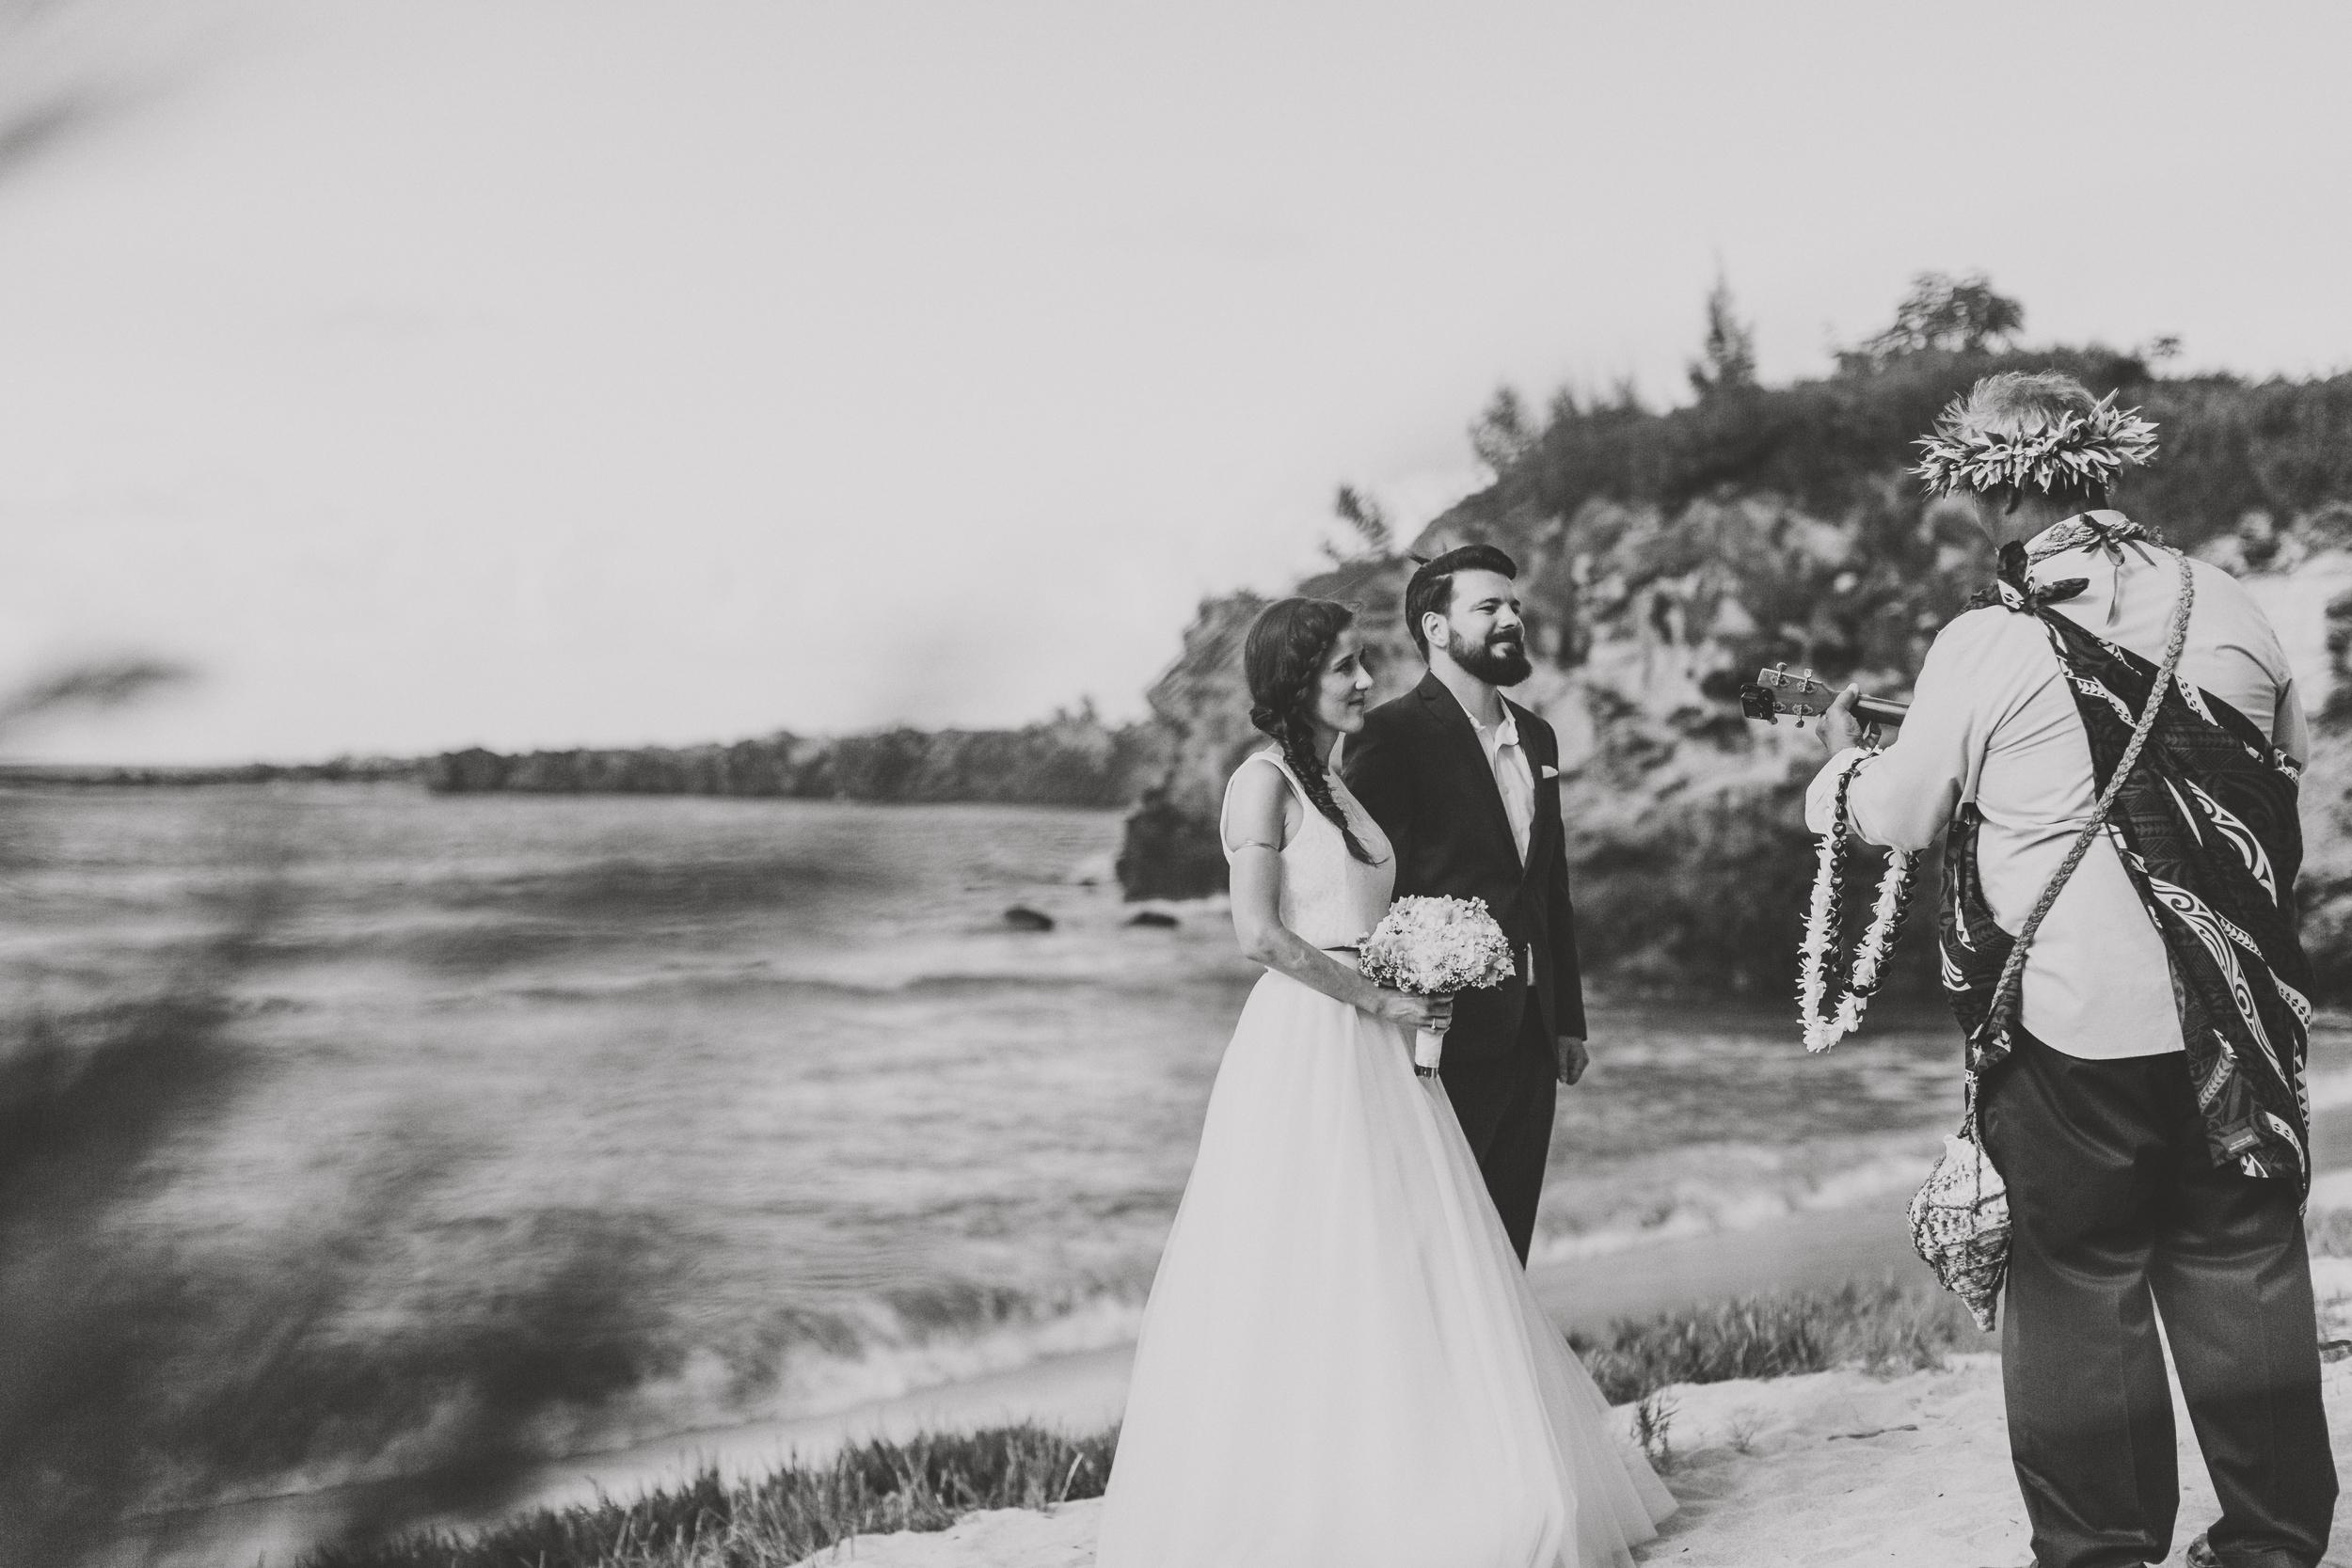 angie-diaz-photography-maui-wedding-ironwoods-beach-9.jpg